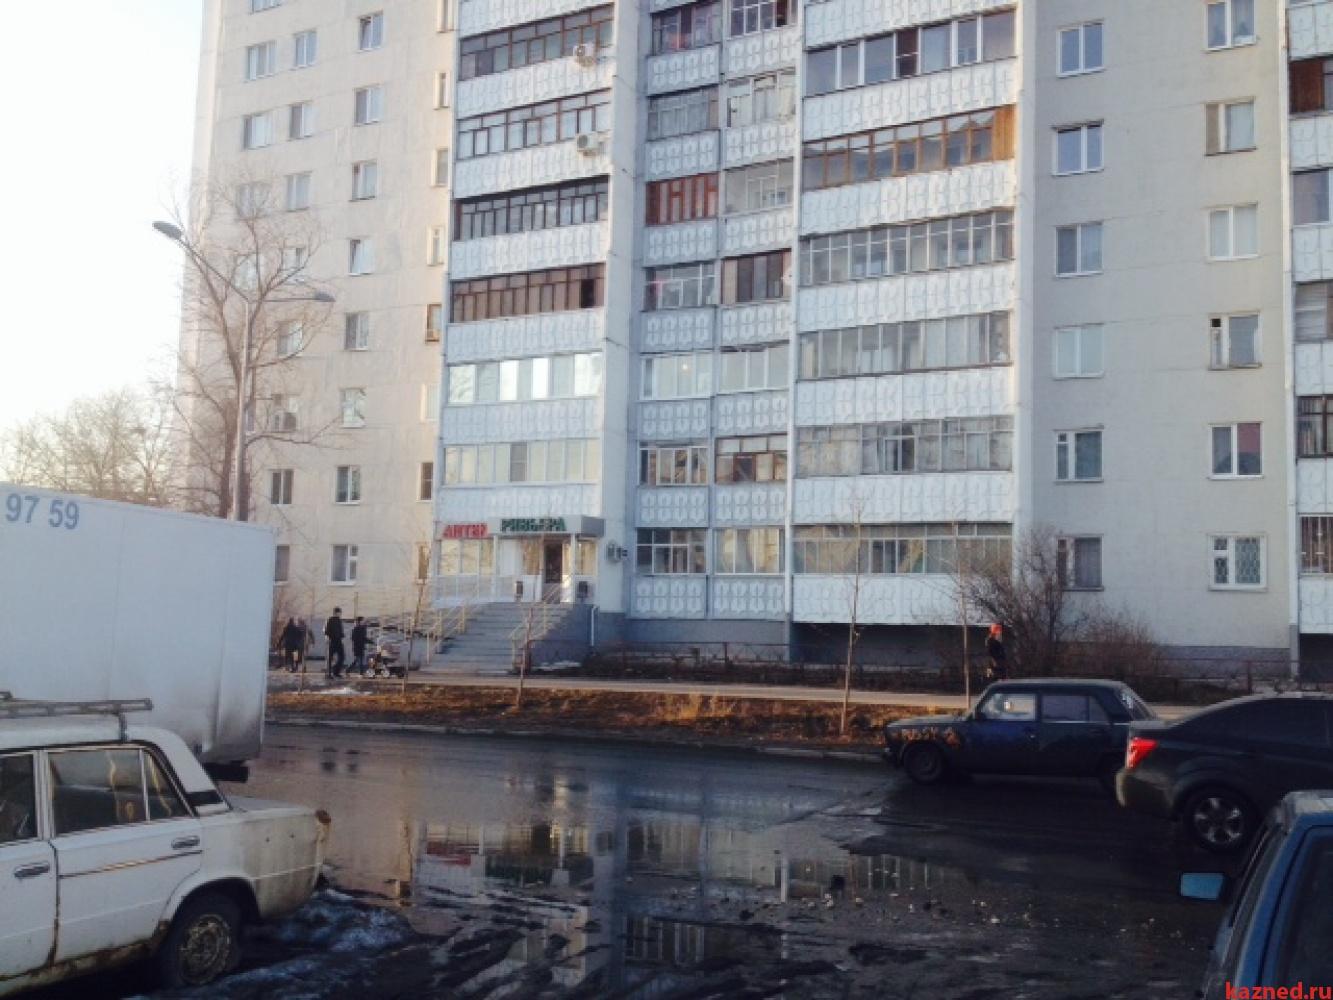 Продажа 2-к квартиры Кул Гали,11/52Б, 50 м2  (миниатюра №6)